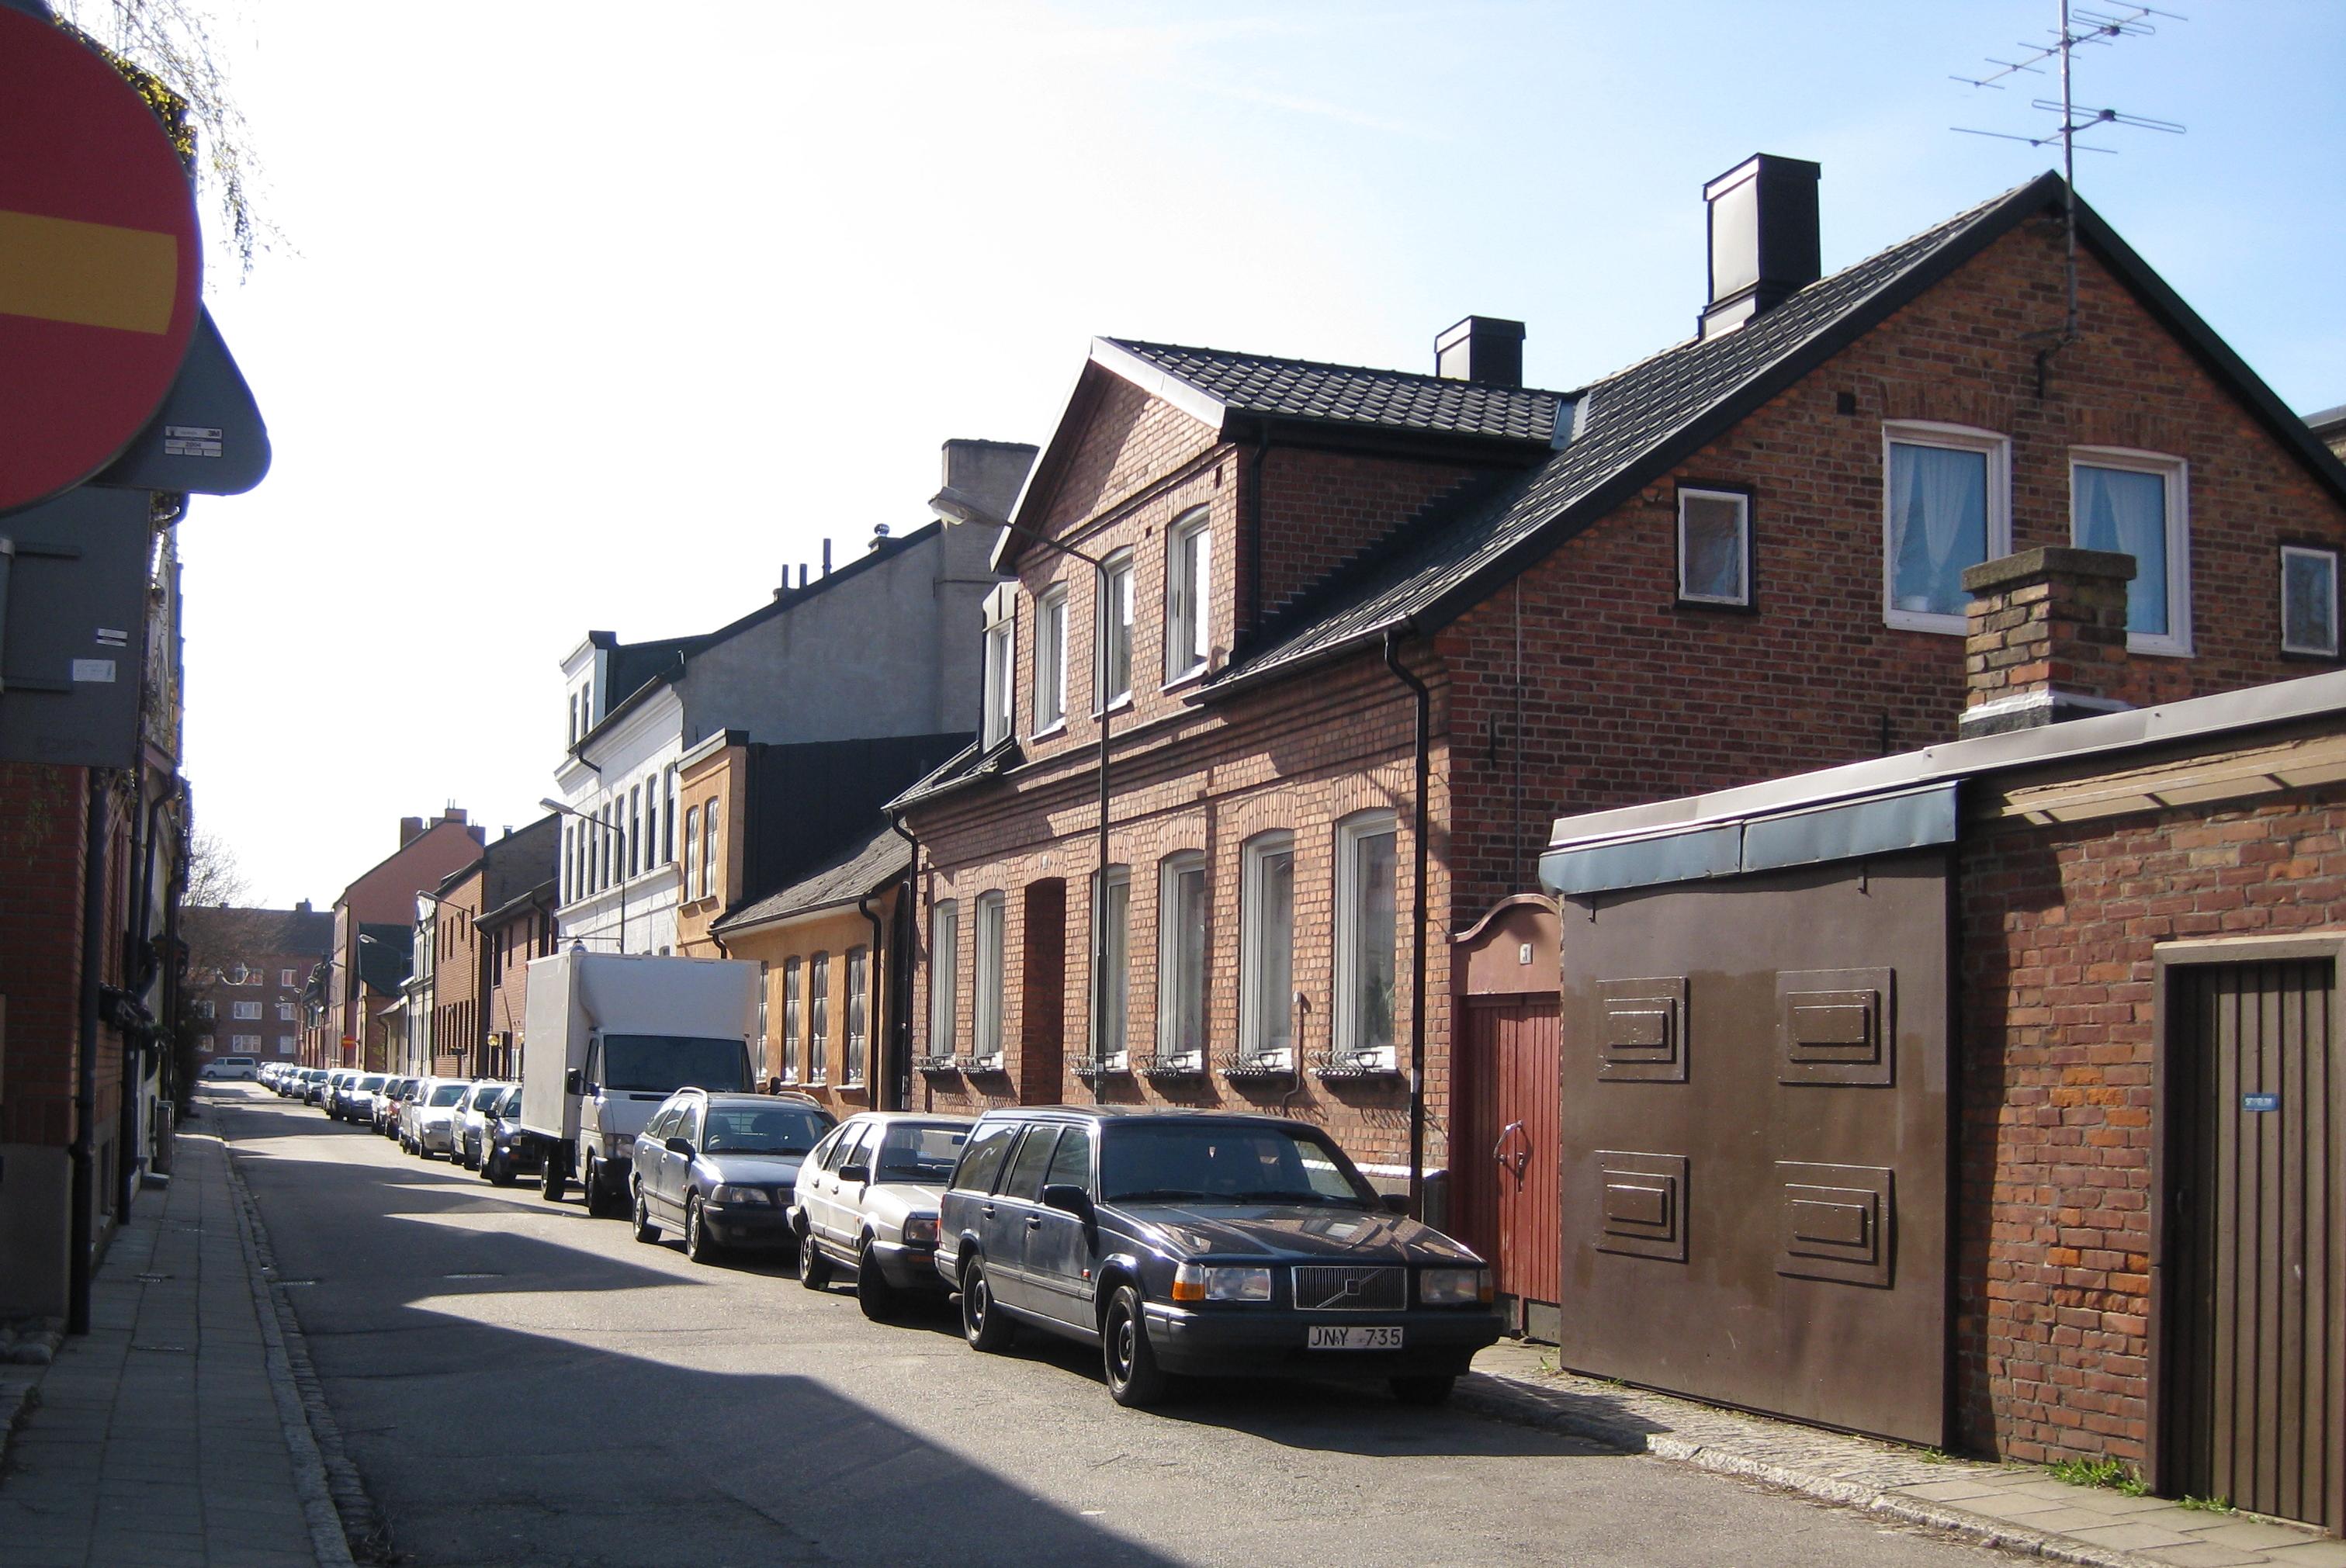 BID Sofielund: fastighetsgares roll i omrdesutveckling